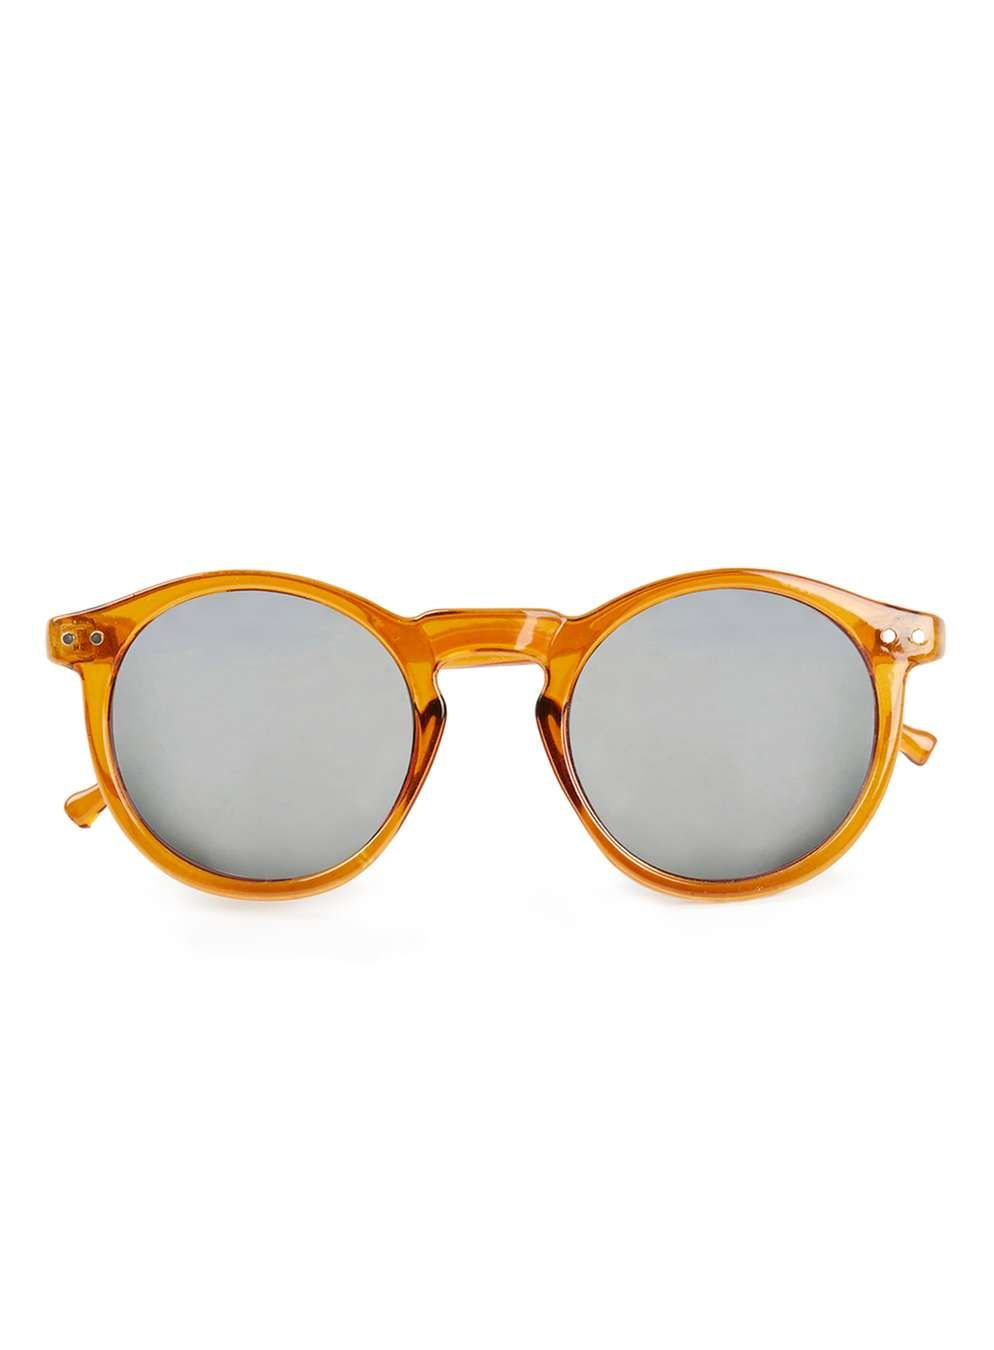 h and m uk mens sunglasses